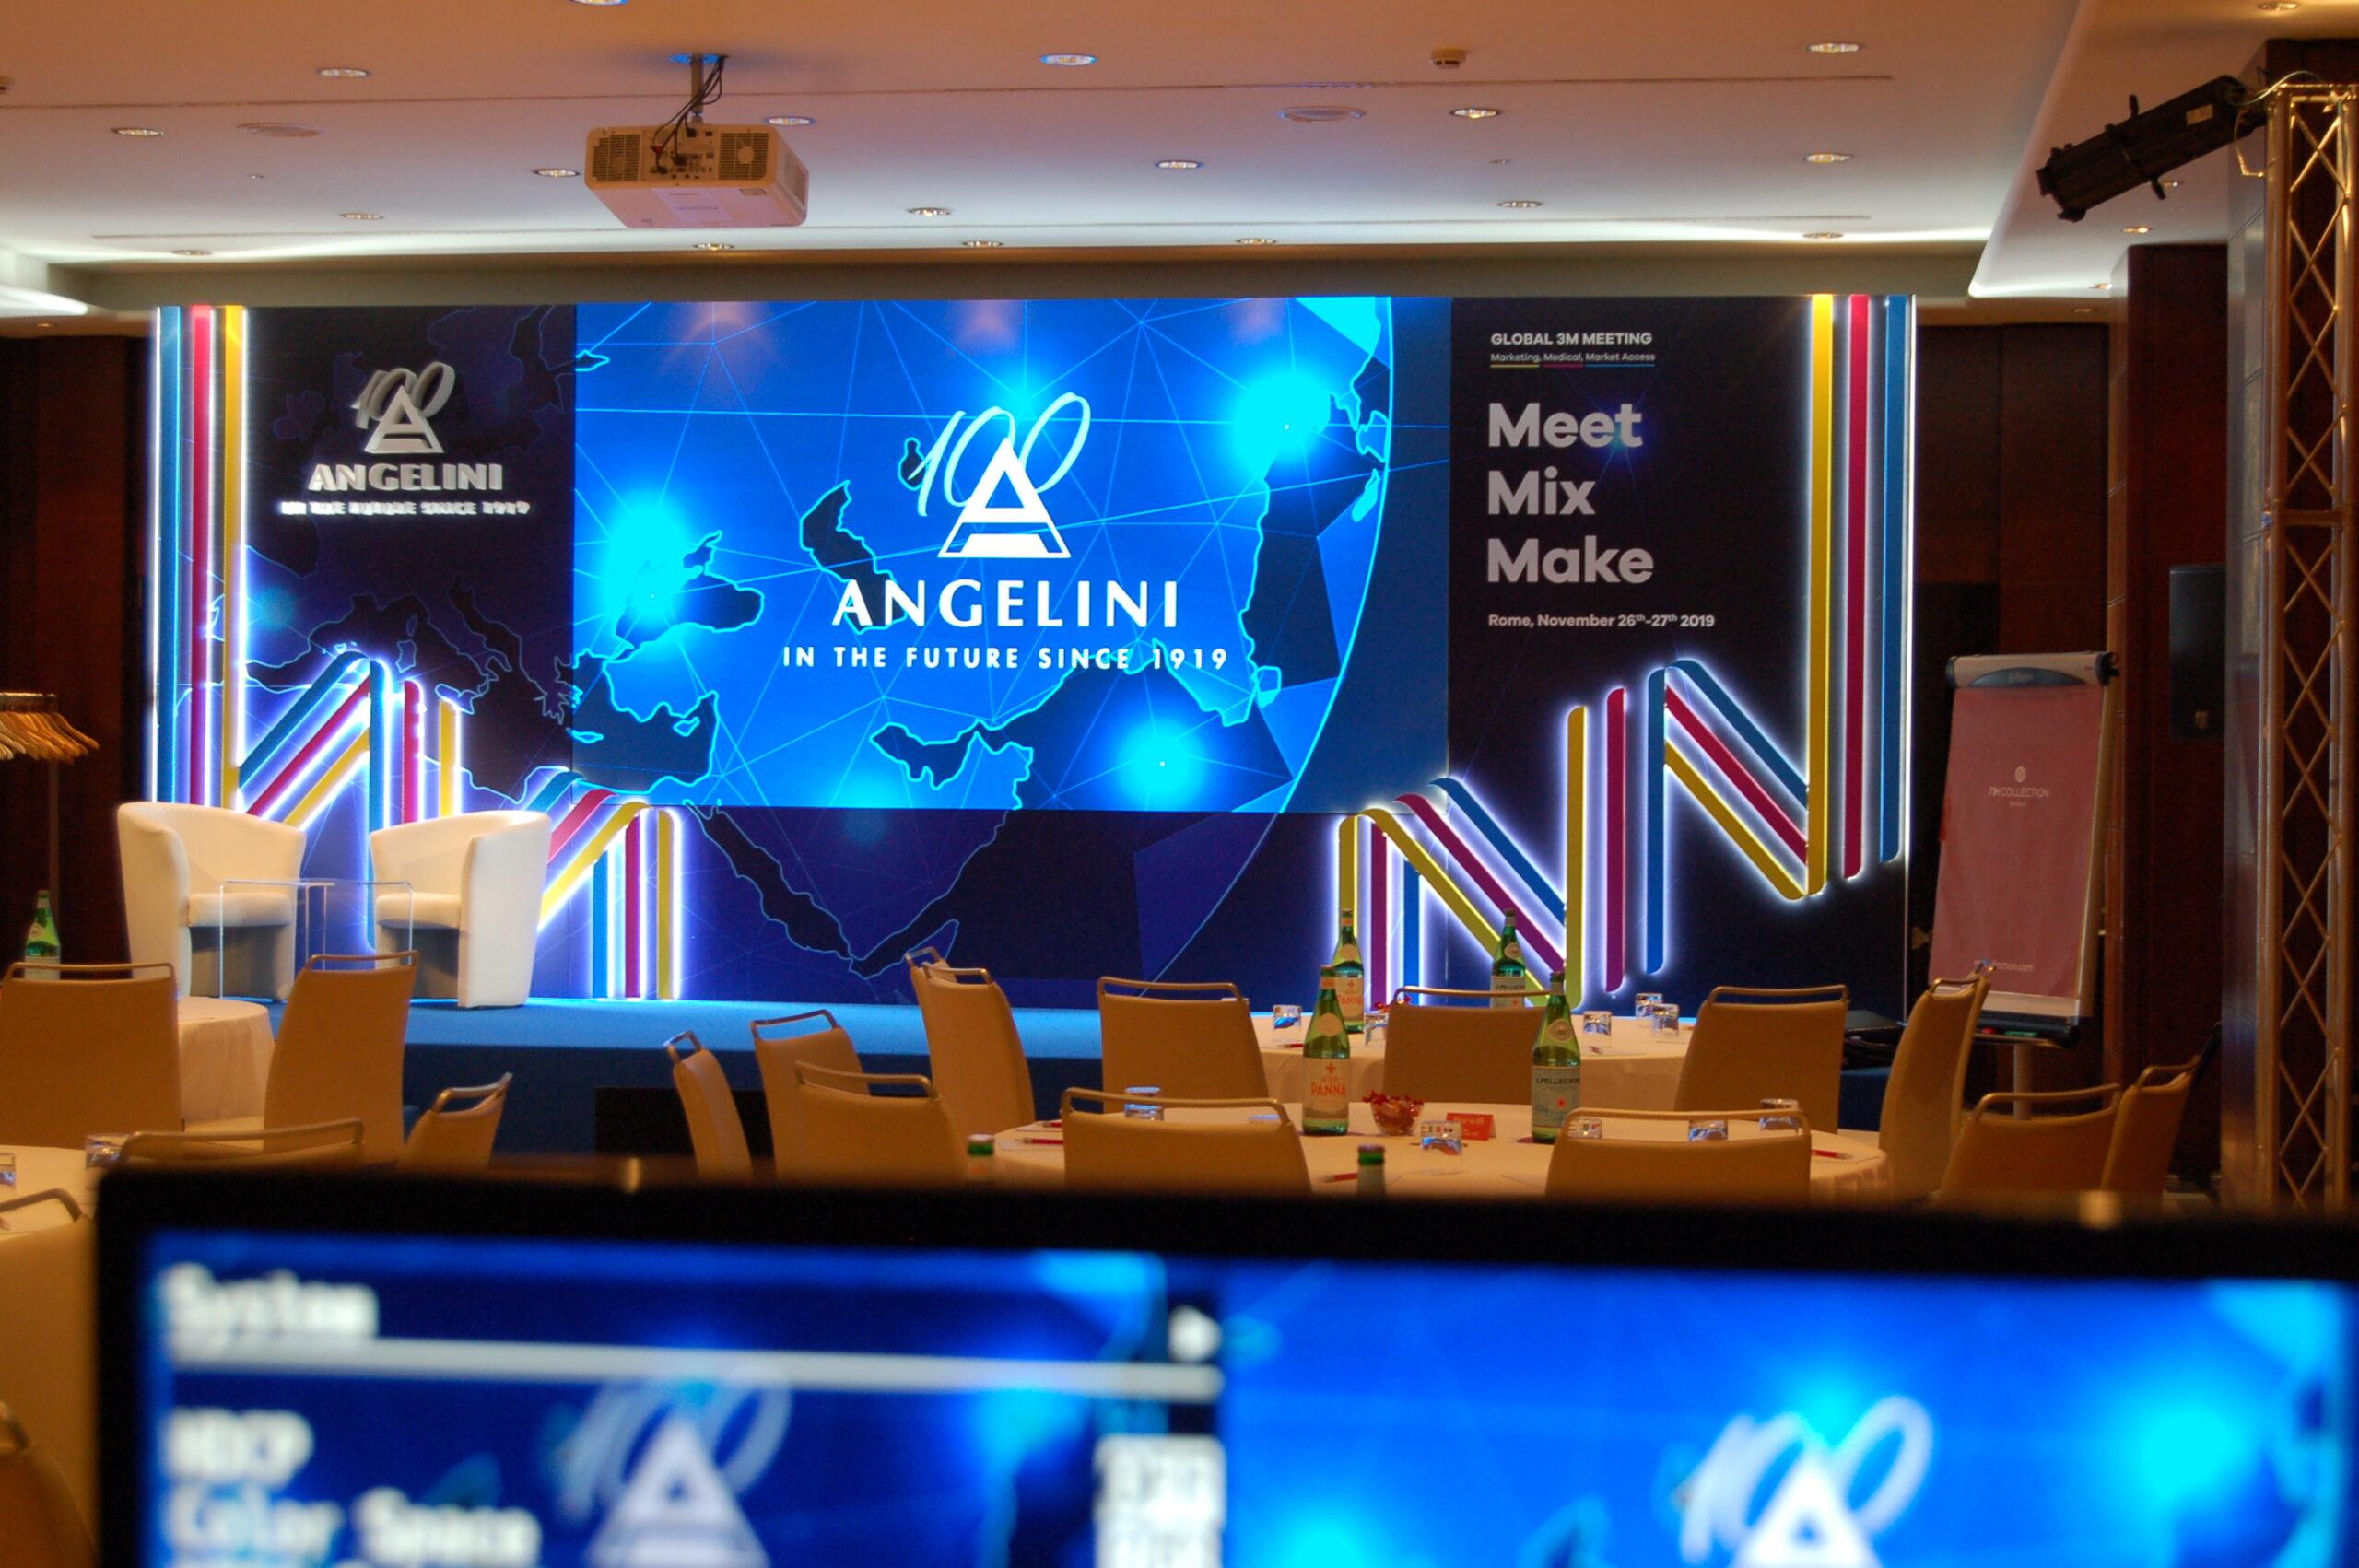 https://www.fareservizitecnici.it/wp-content/uploads/2020/02/Angelini-evento-scaled.jpg